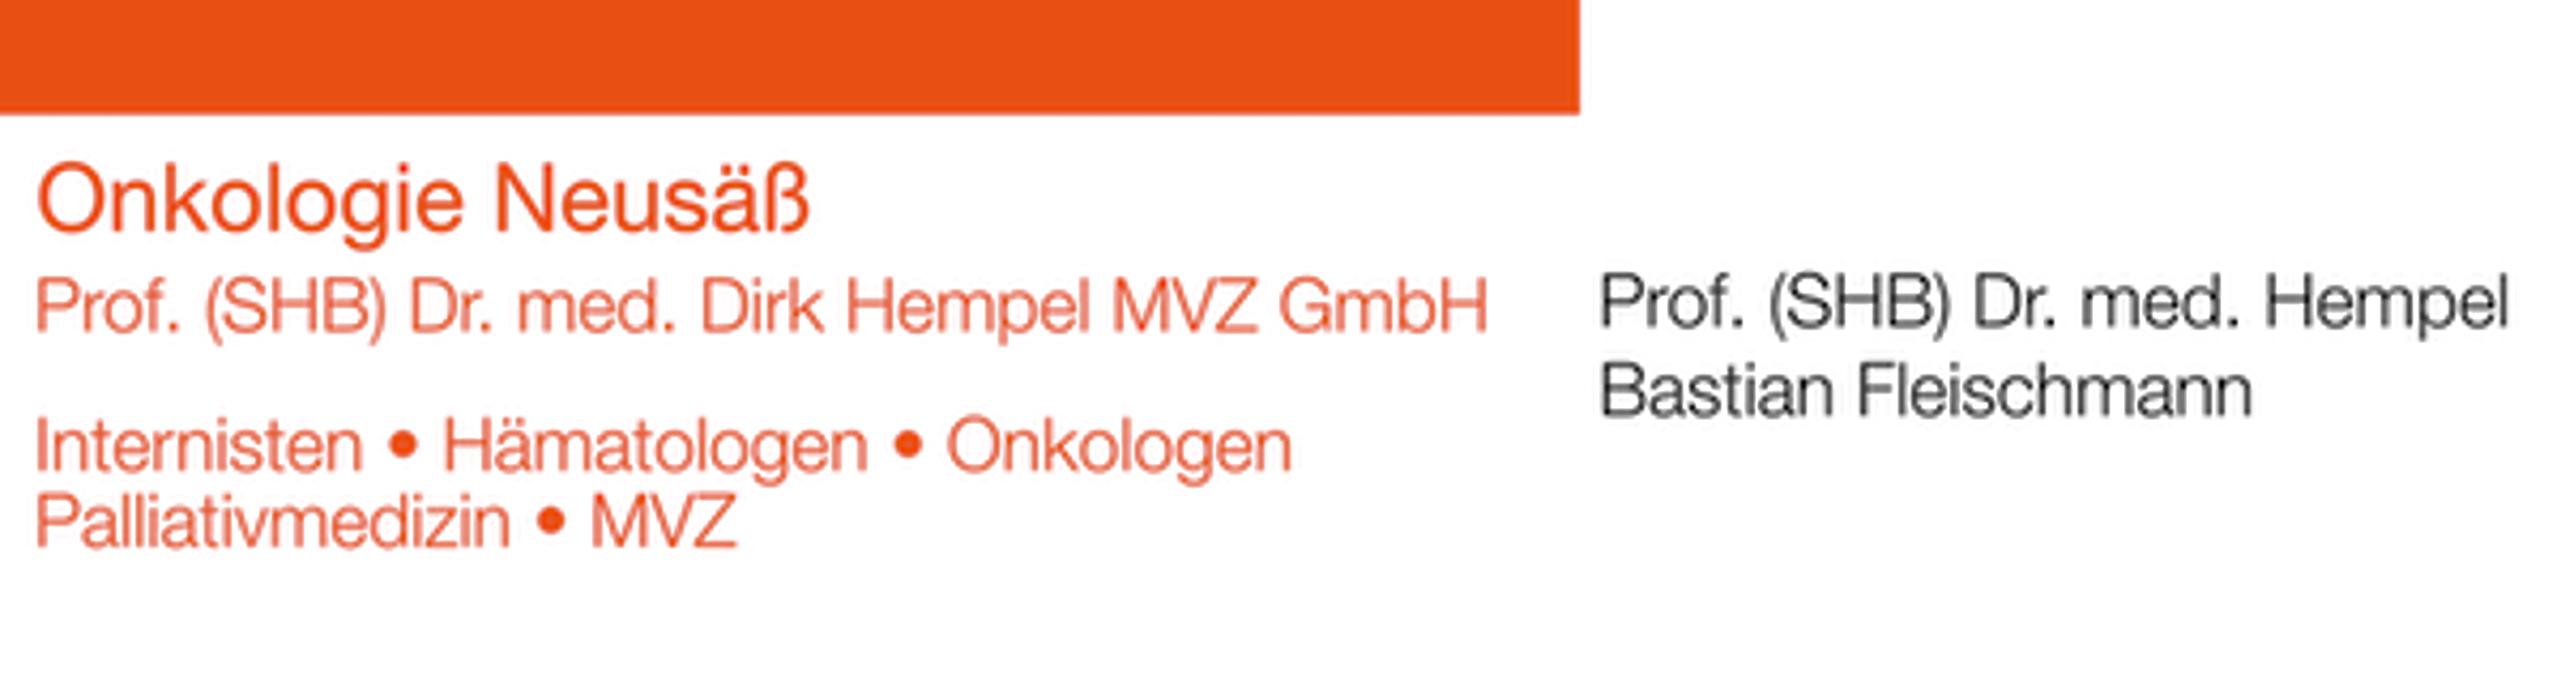 Bild zu Onkologie Neusäss Prof. (SHB) Dr. Dirk Hempel MVZ GmbH in Neusäß